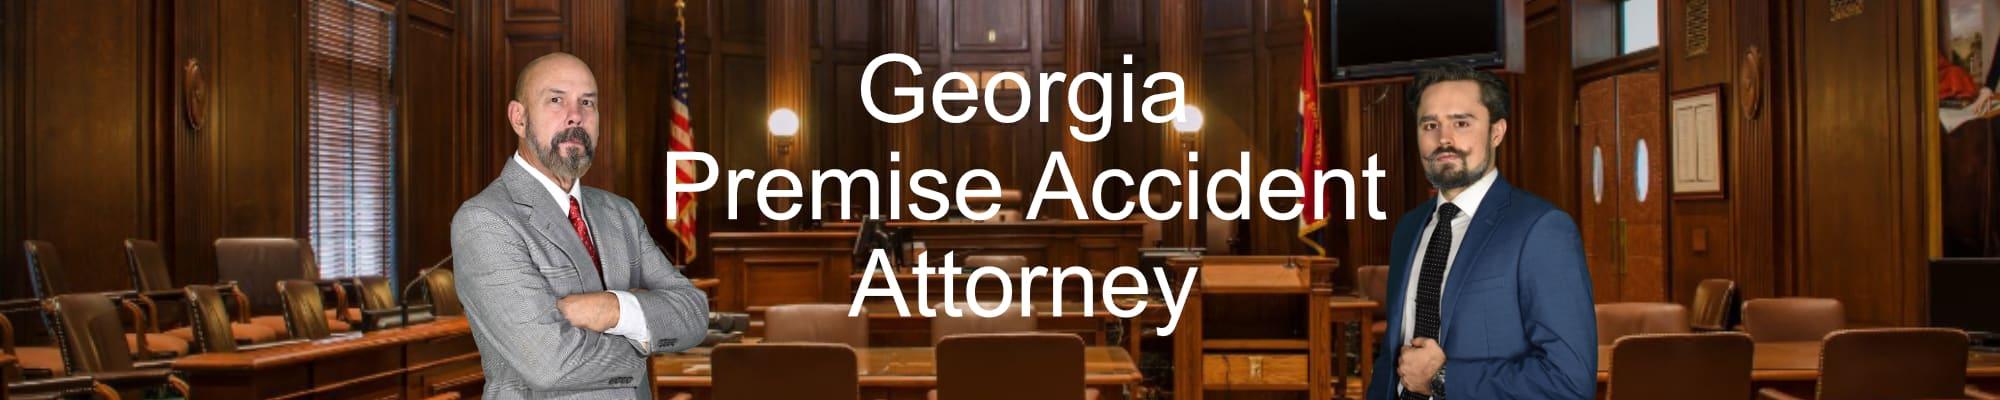 Georgia-Premise-Accident-Attorney-Slip-Fall-Broken-Settlement-Lawyer